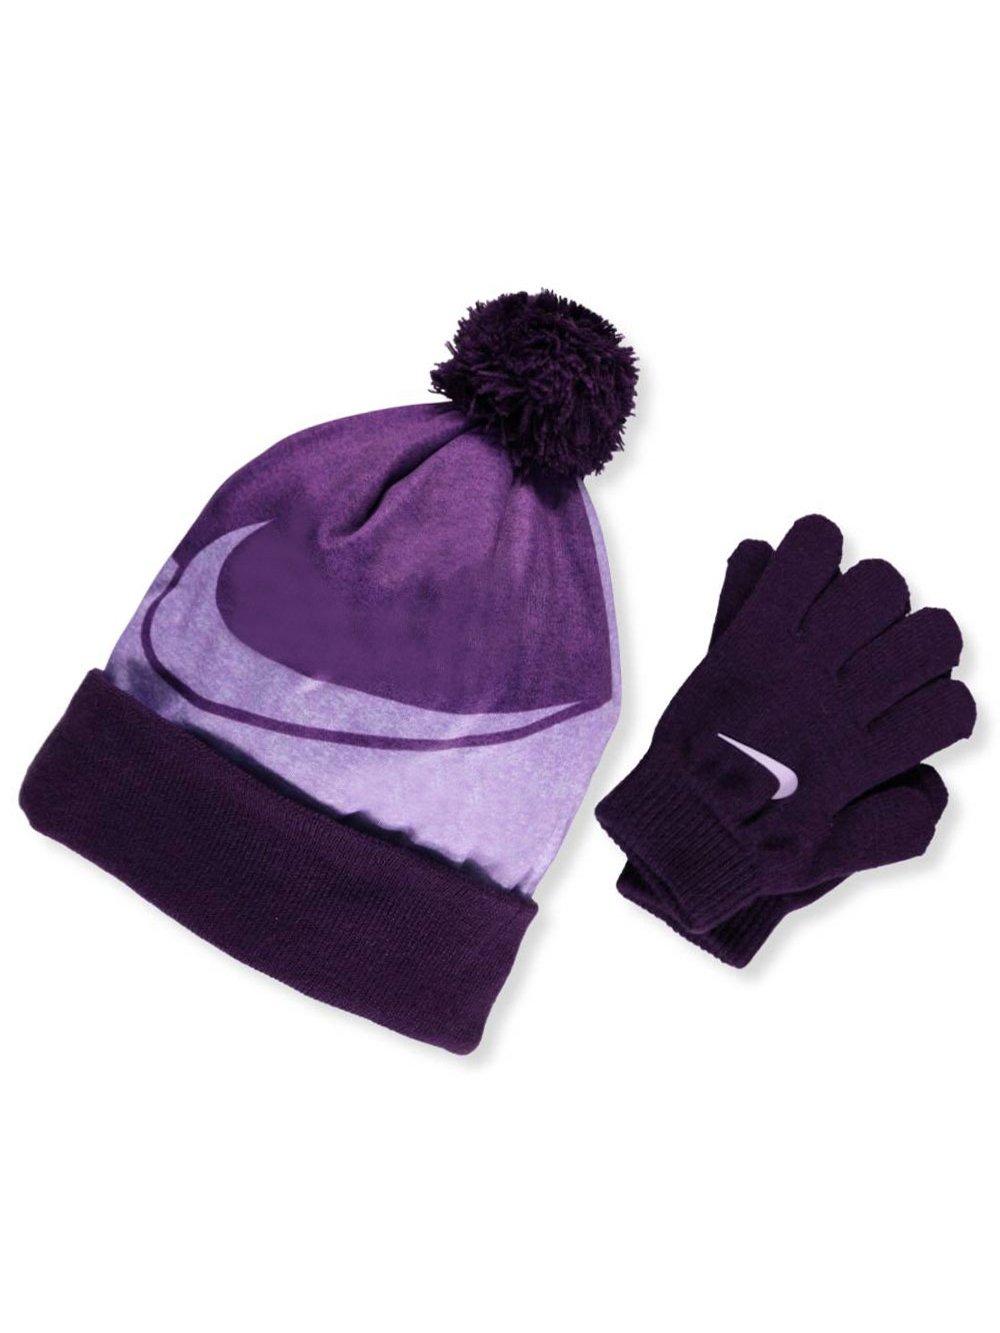 NIKE Big Girls' Beanie & Gloves Set (One Size) - Bold Berry, 7-16 by NIKE (Image #1)